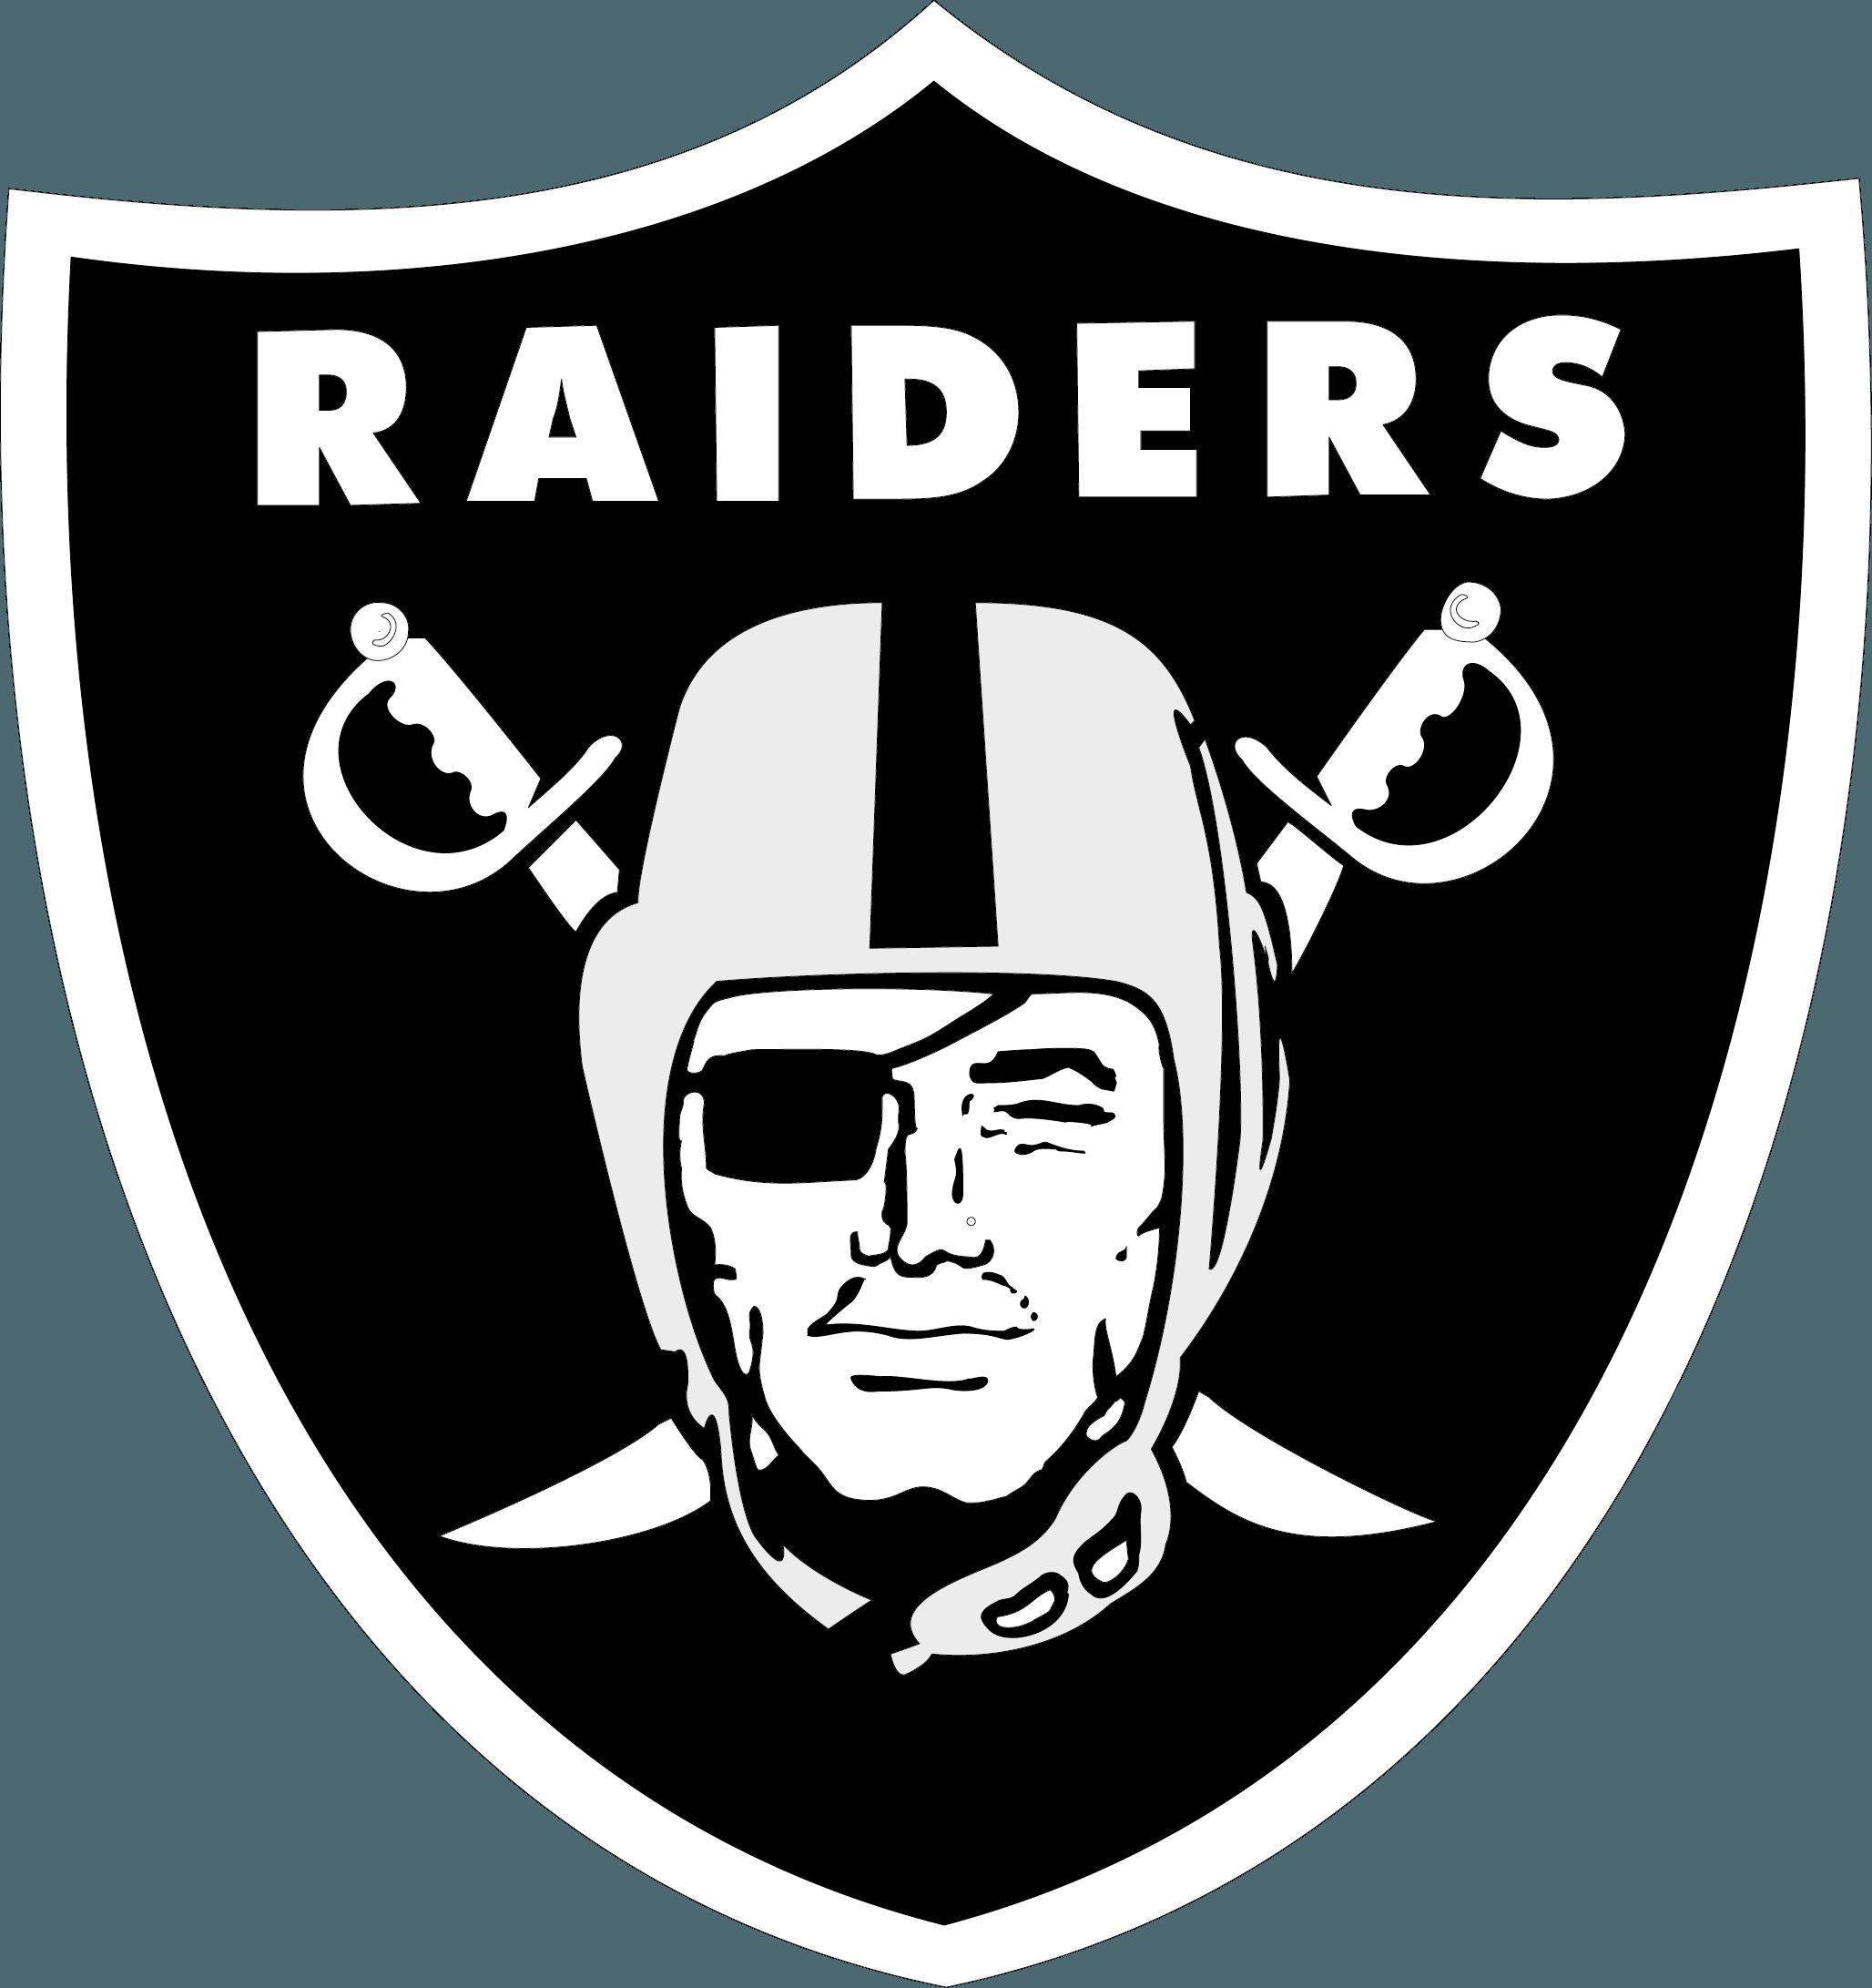 oakland raiders logo vector eps free download logo icons clipart rh freelogovectors net Oakland Raiders Decals oakland raiders clipart free